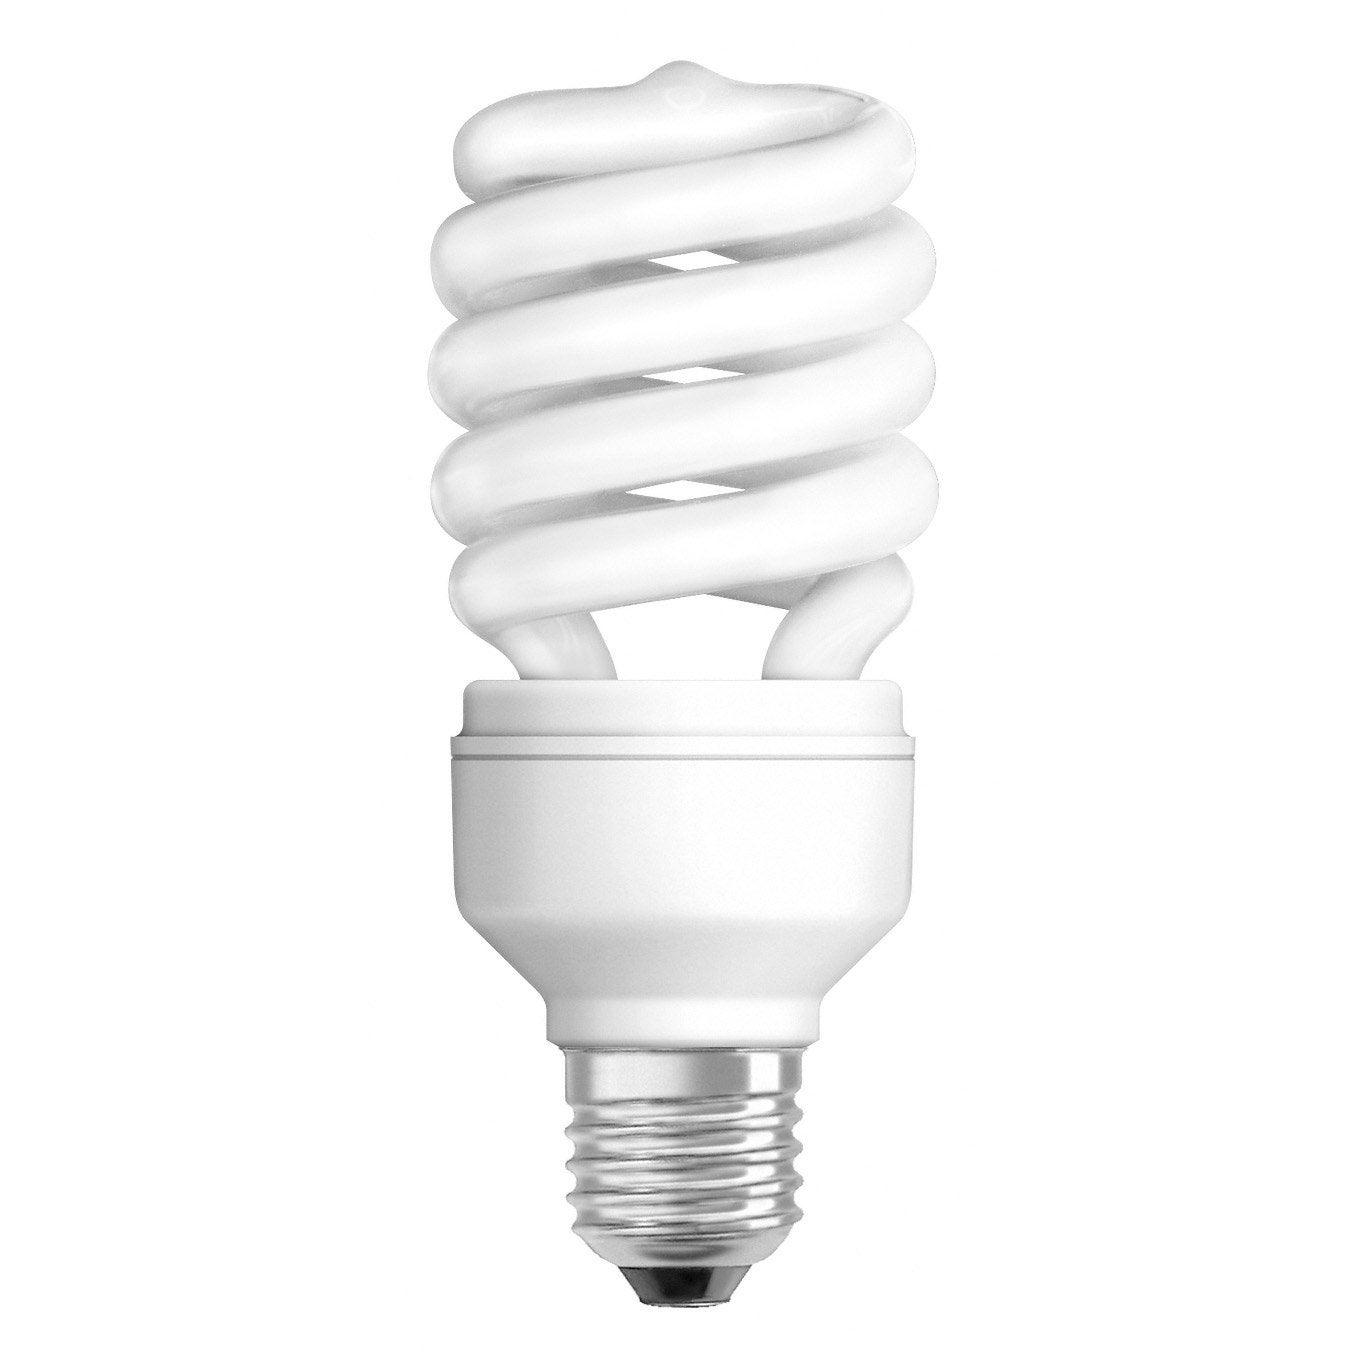 ampoule spirale conomie d 39 nergie 23w osram e27 lumi re. Black Bedroom Furniture Sets. Home Design Ideas